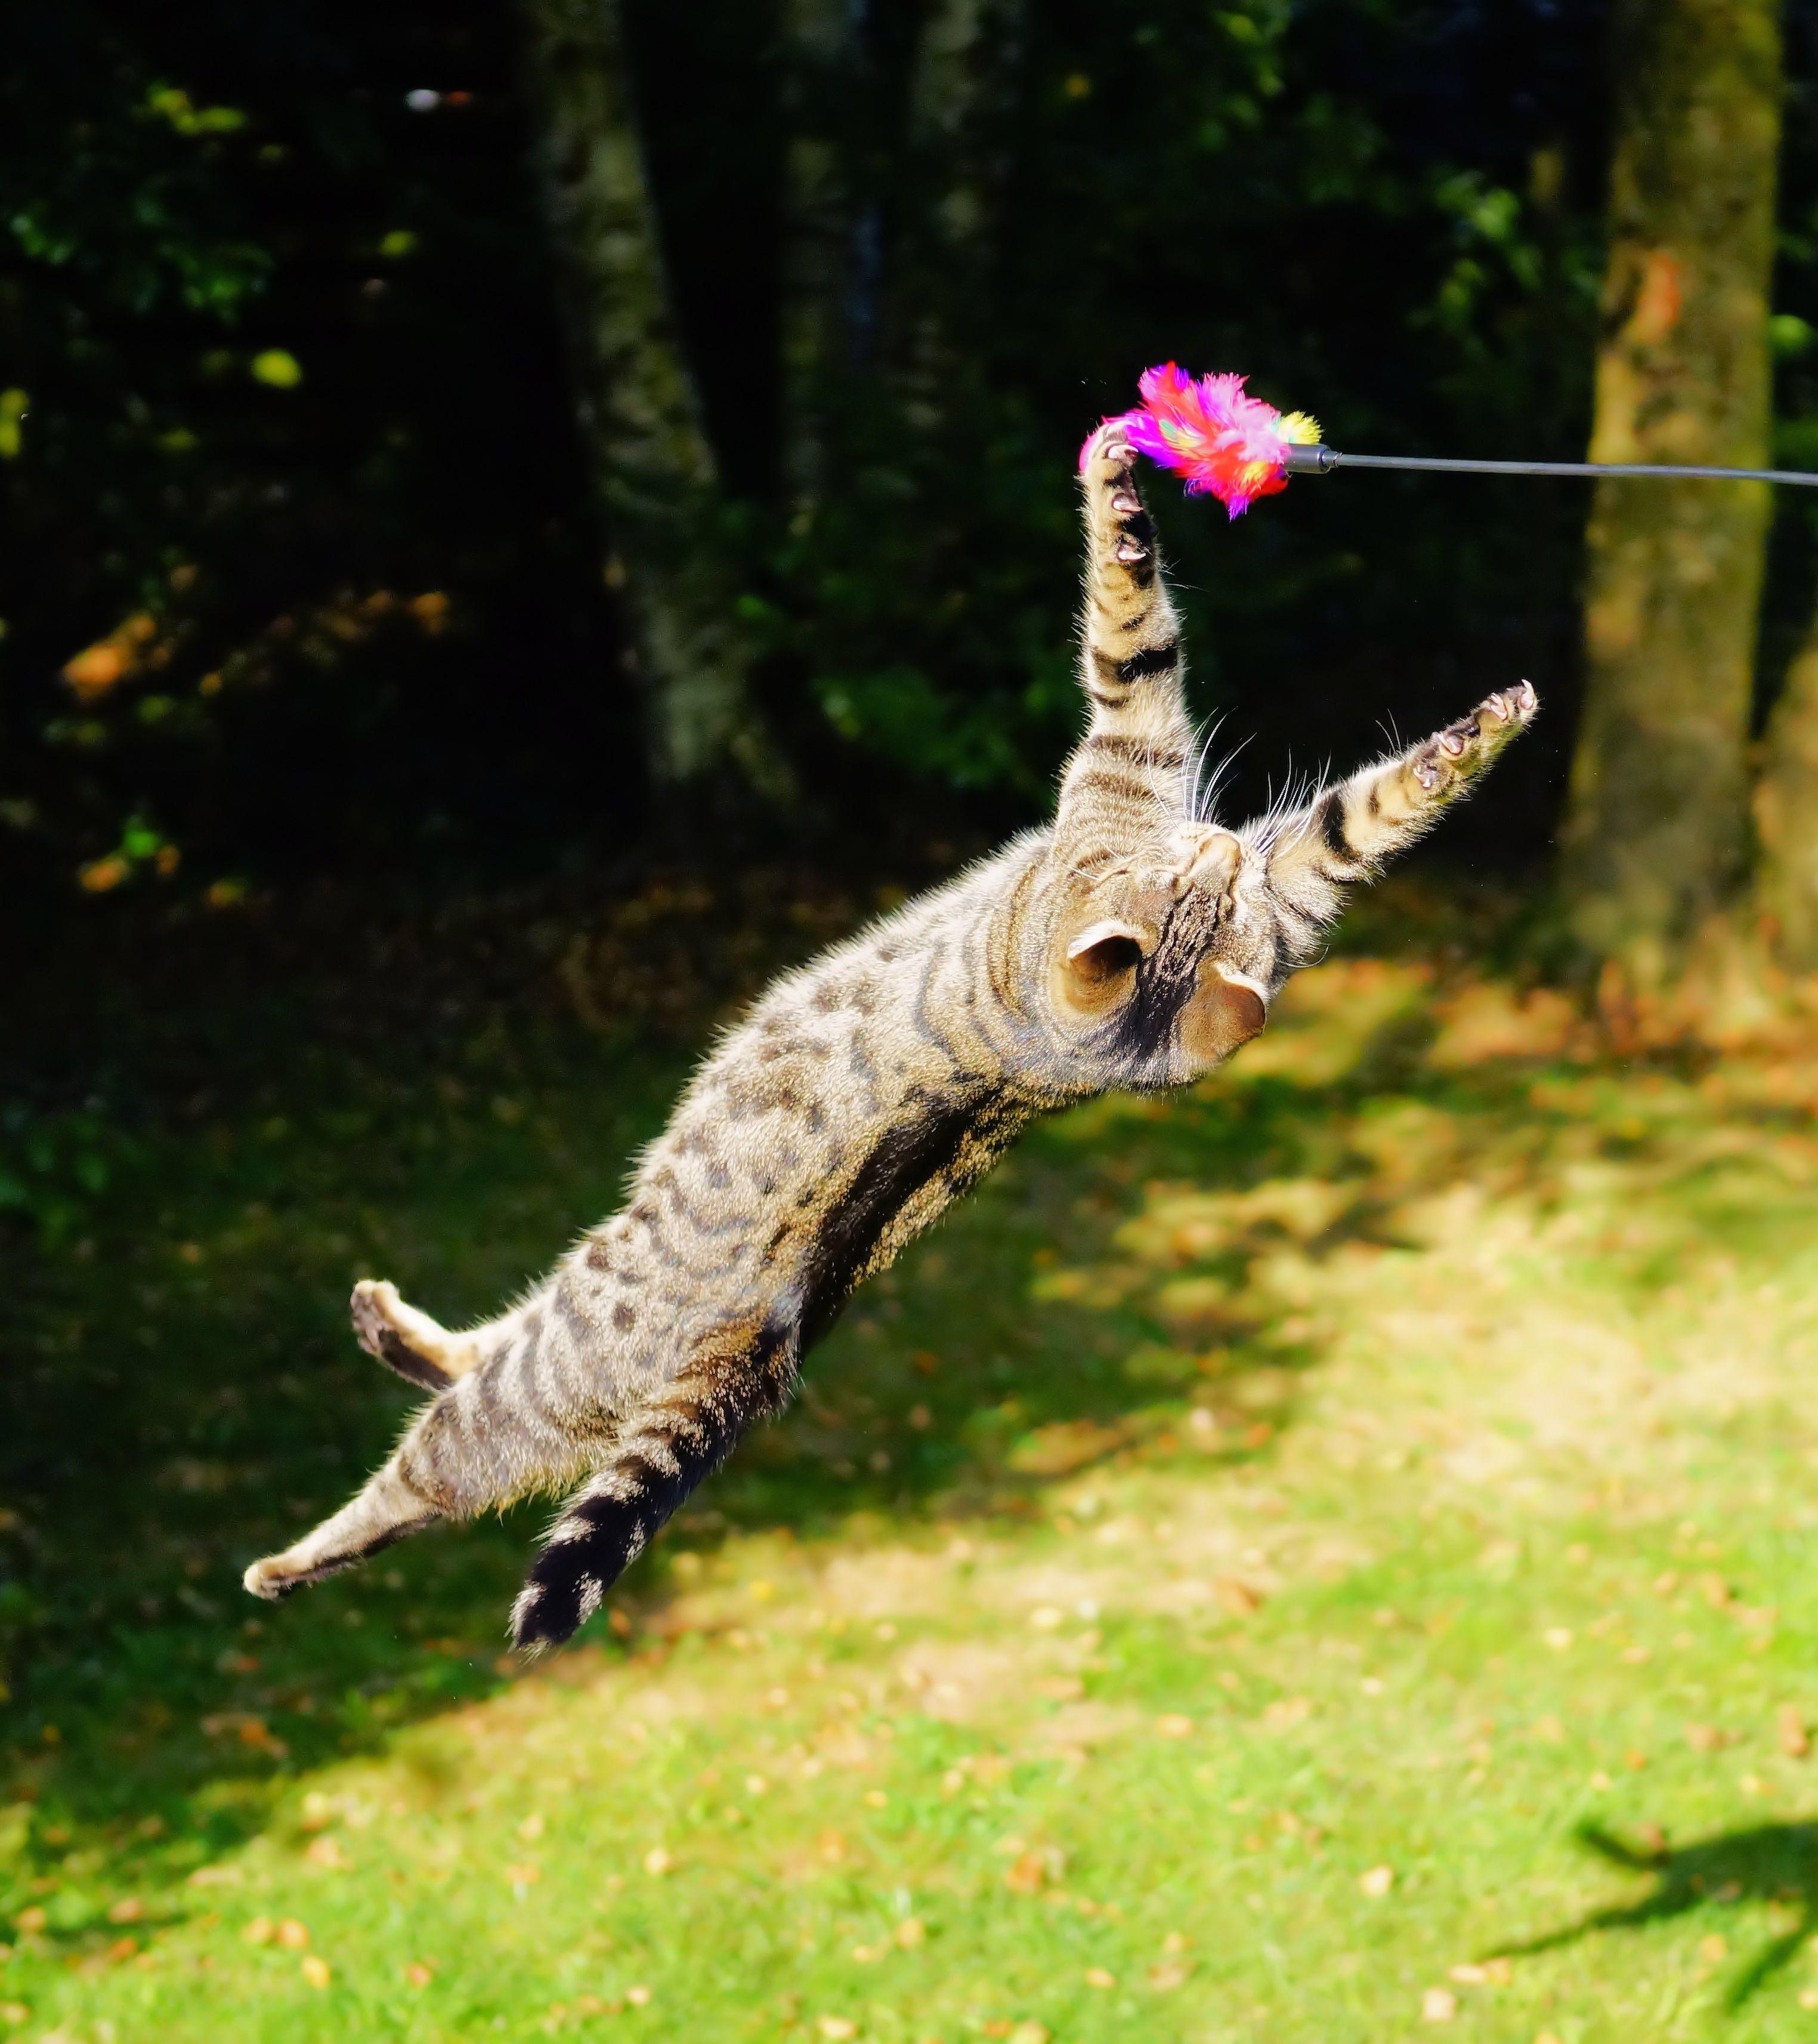 Unduh 99+  Gambar Kucing Olahraga Terbaik HD